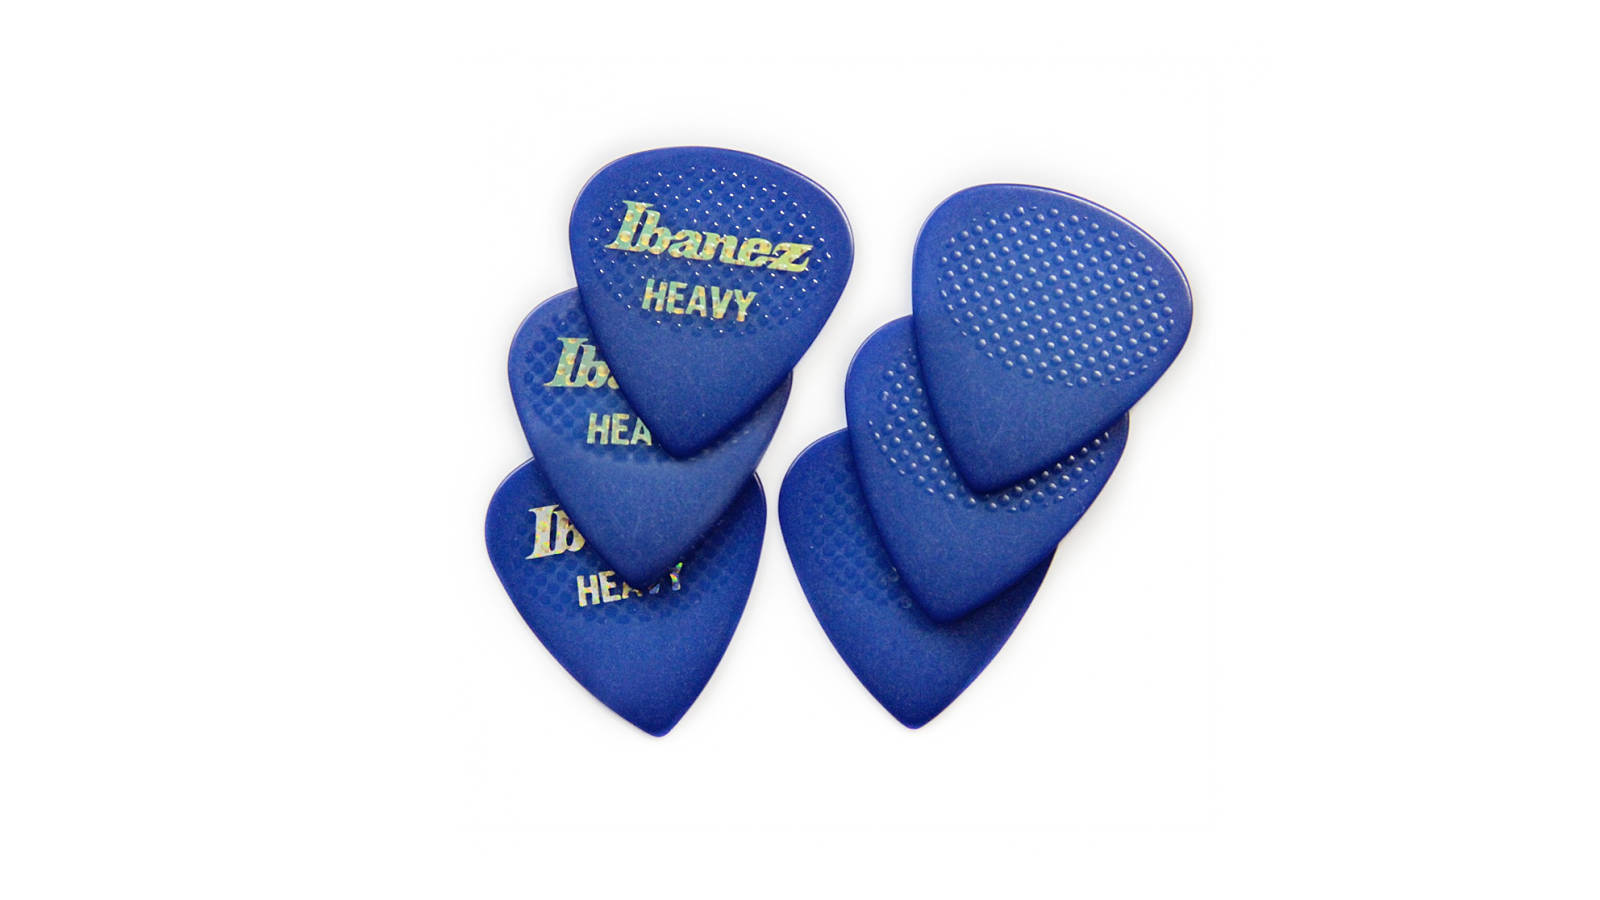 Ibanez Pick SET Rubber Grip heavy BPA16HR-BL